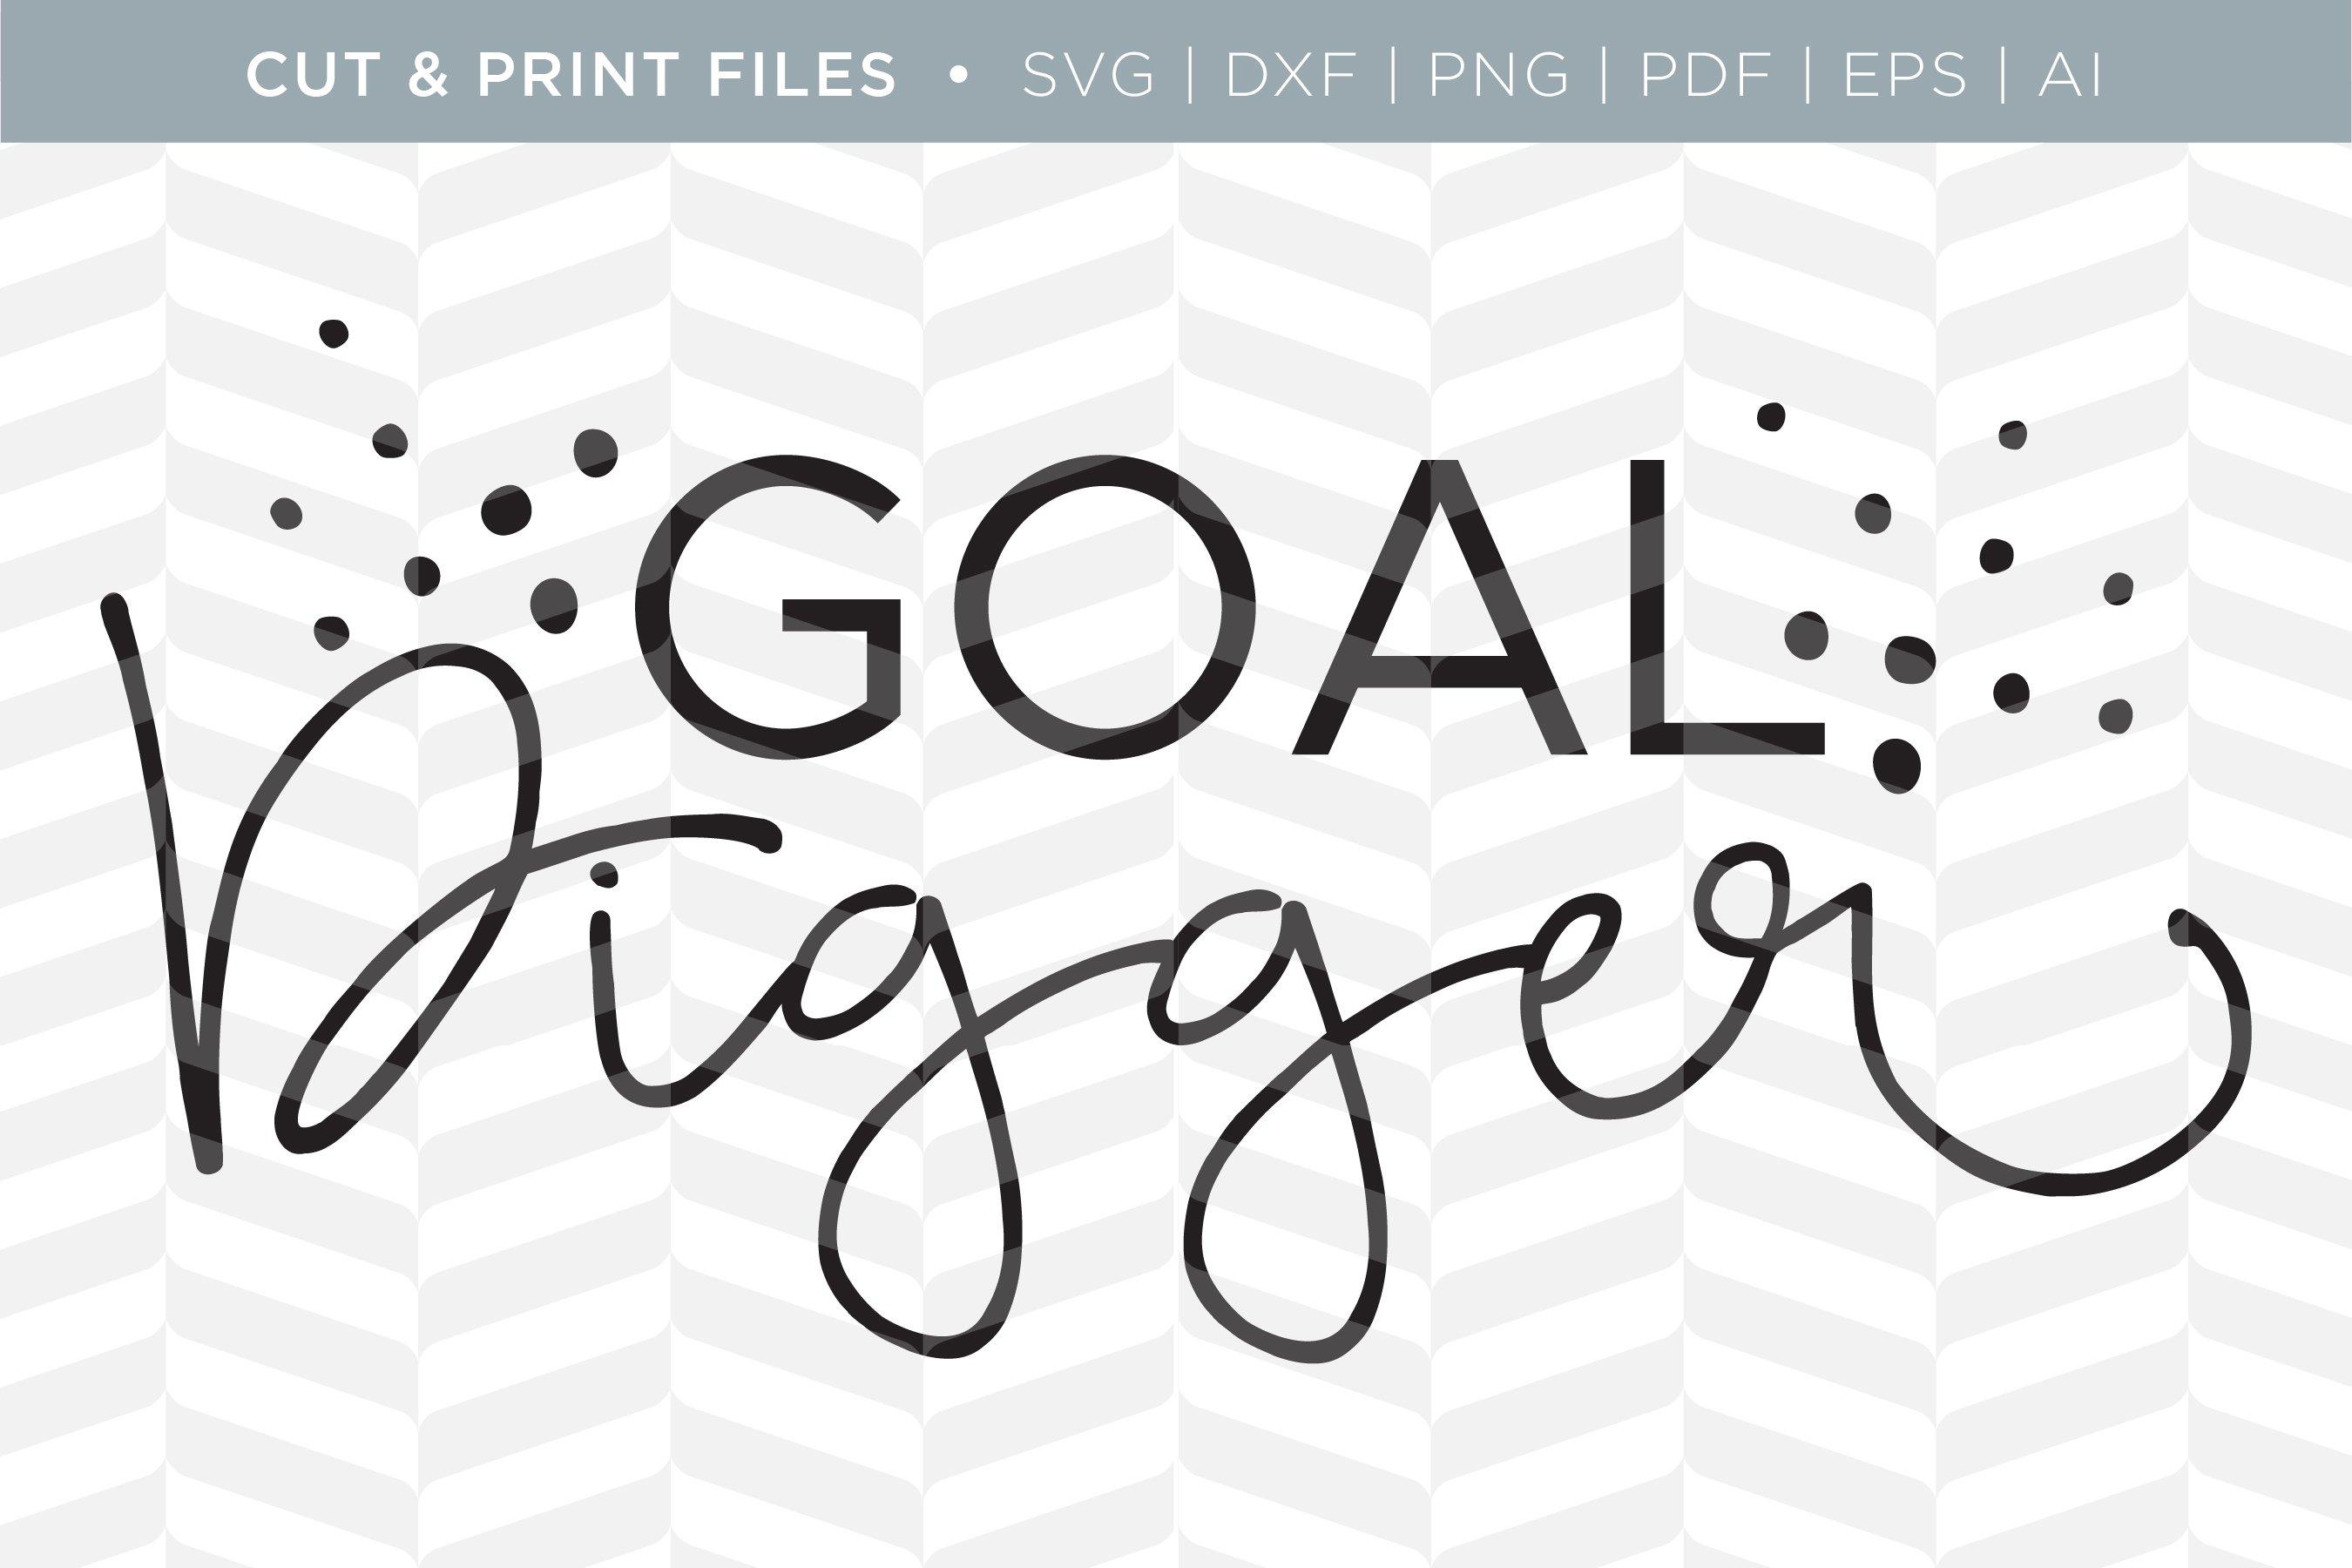 Goal Digger Svg Cut Print Files Pre Designed Illustrator Graphics Creative Market